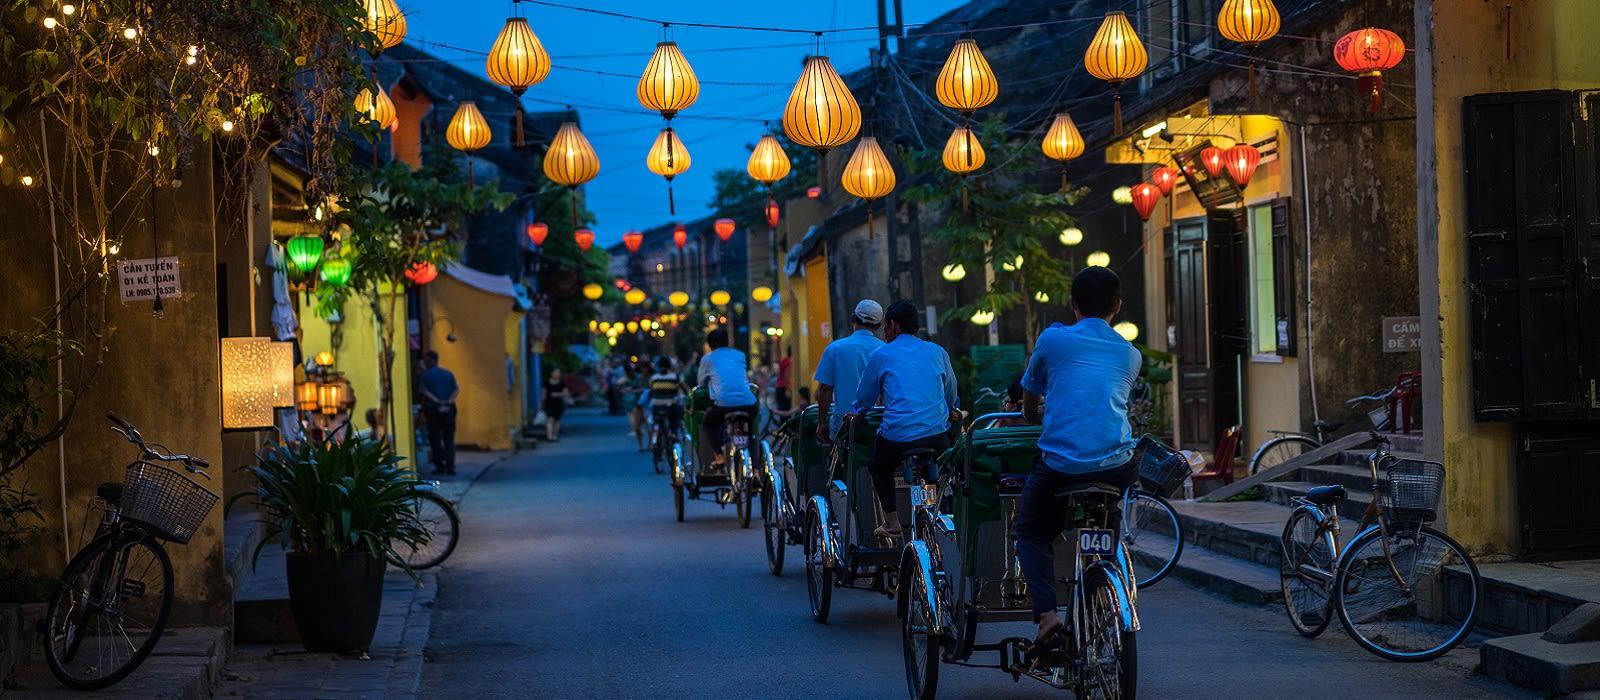 Vietnam Hautnah: Von Hanoi nach Saigon Urlaub 4